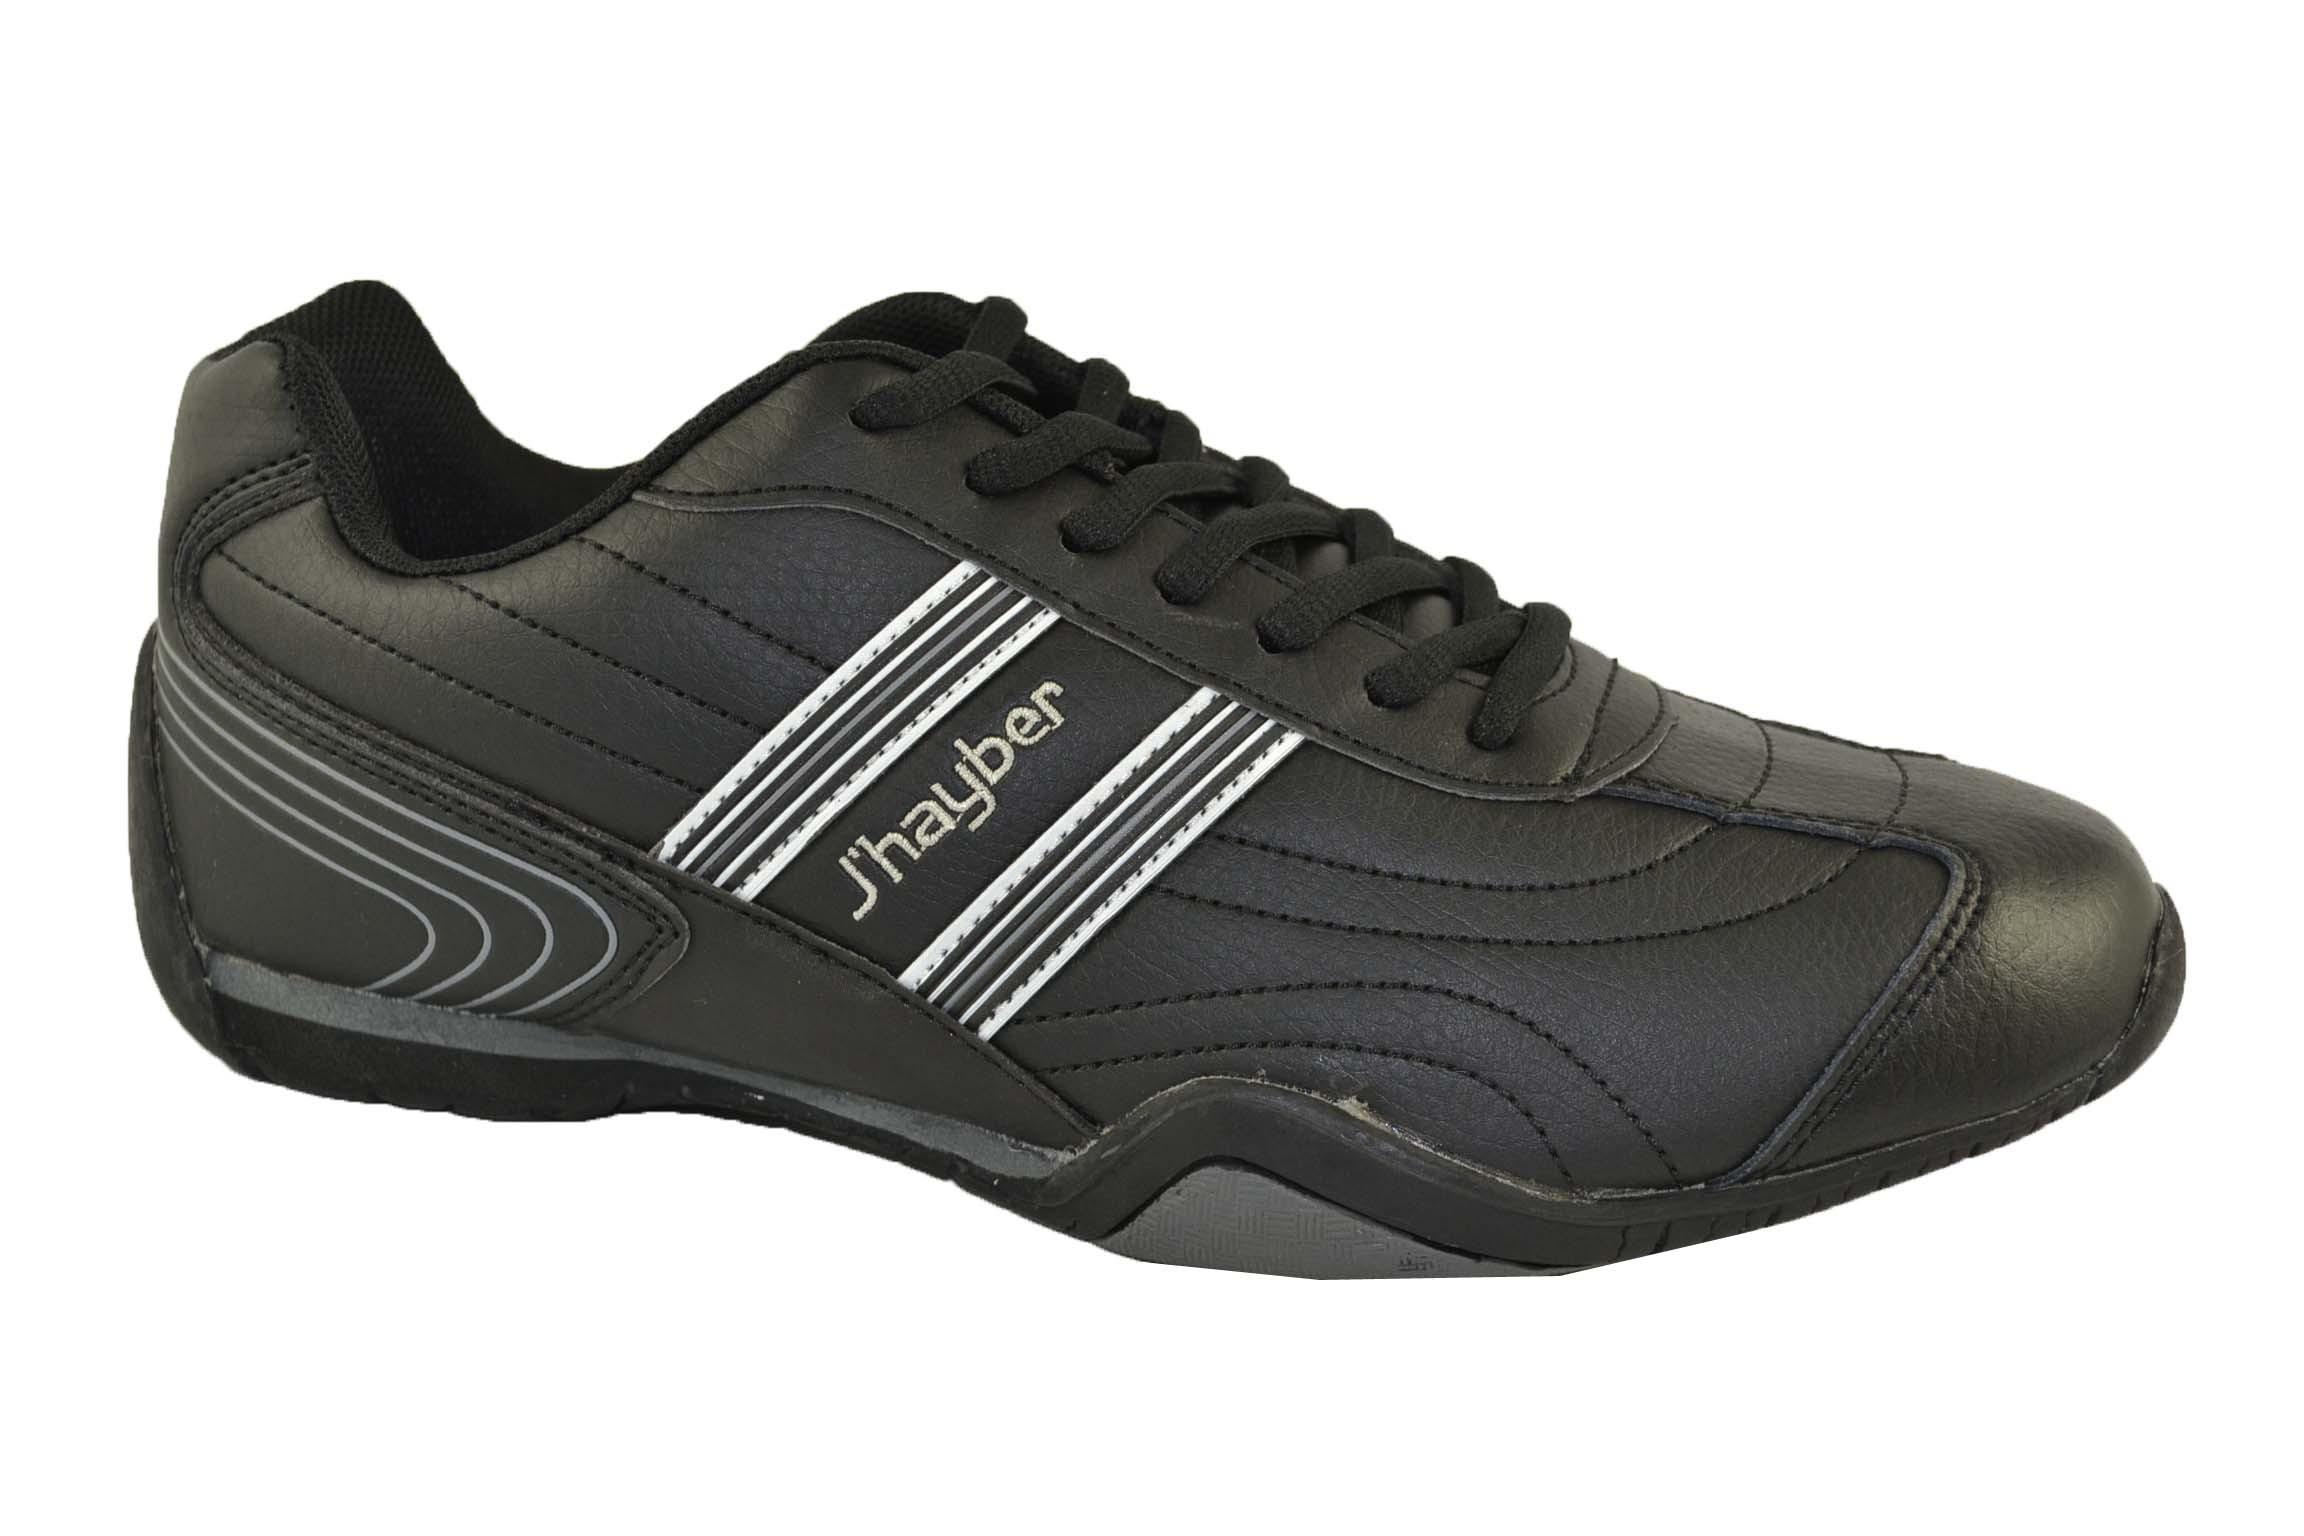 7da939a4b Zapatillas deportivas wakele black J HAYBER